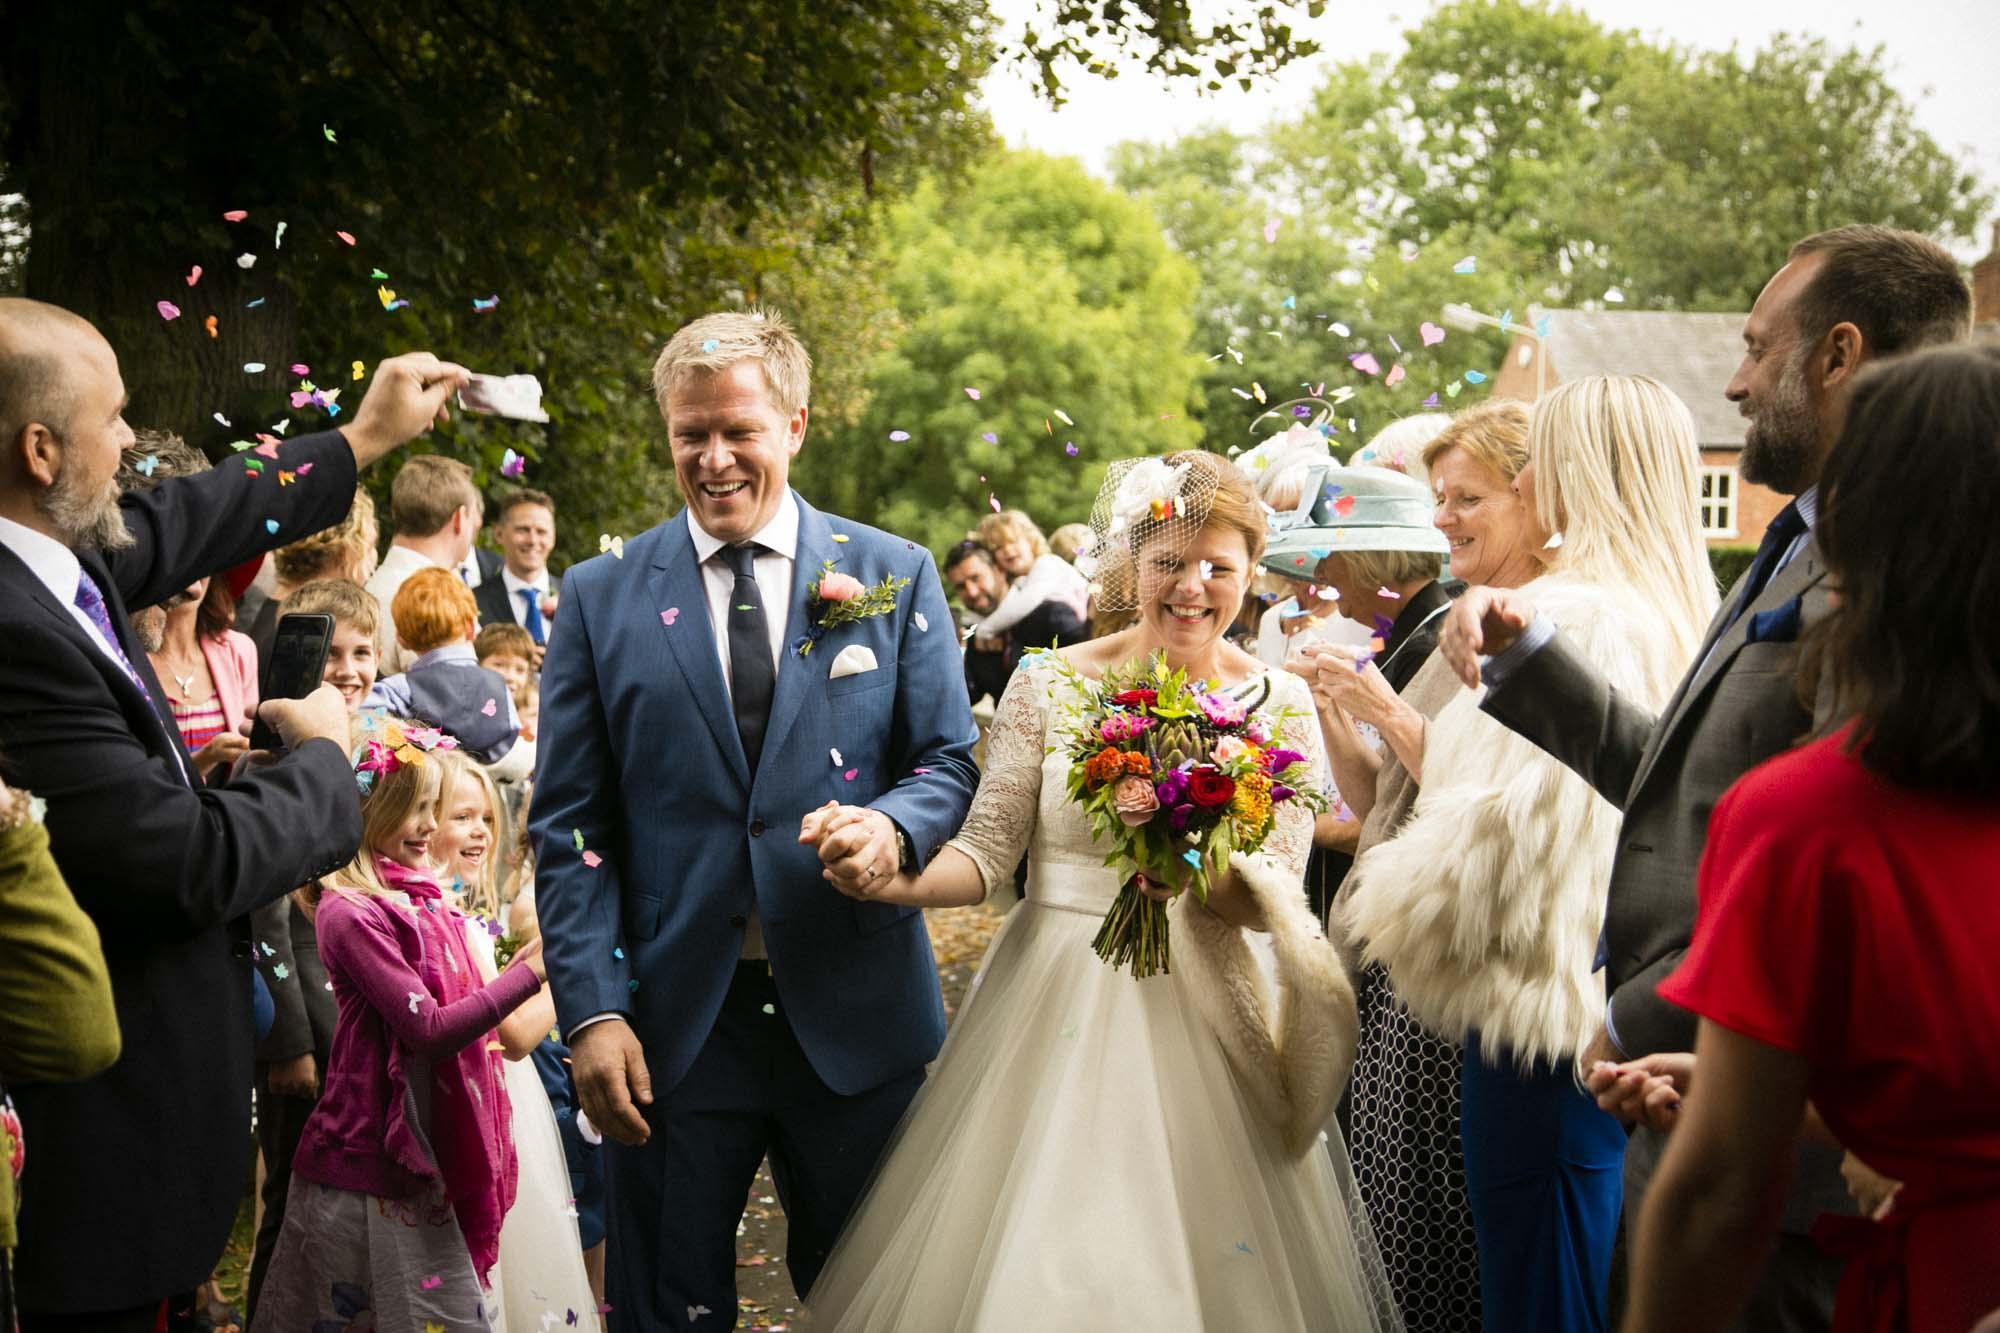 garden-marquee-wedding-slawston-great-bowden-072.jpg